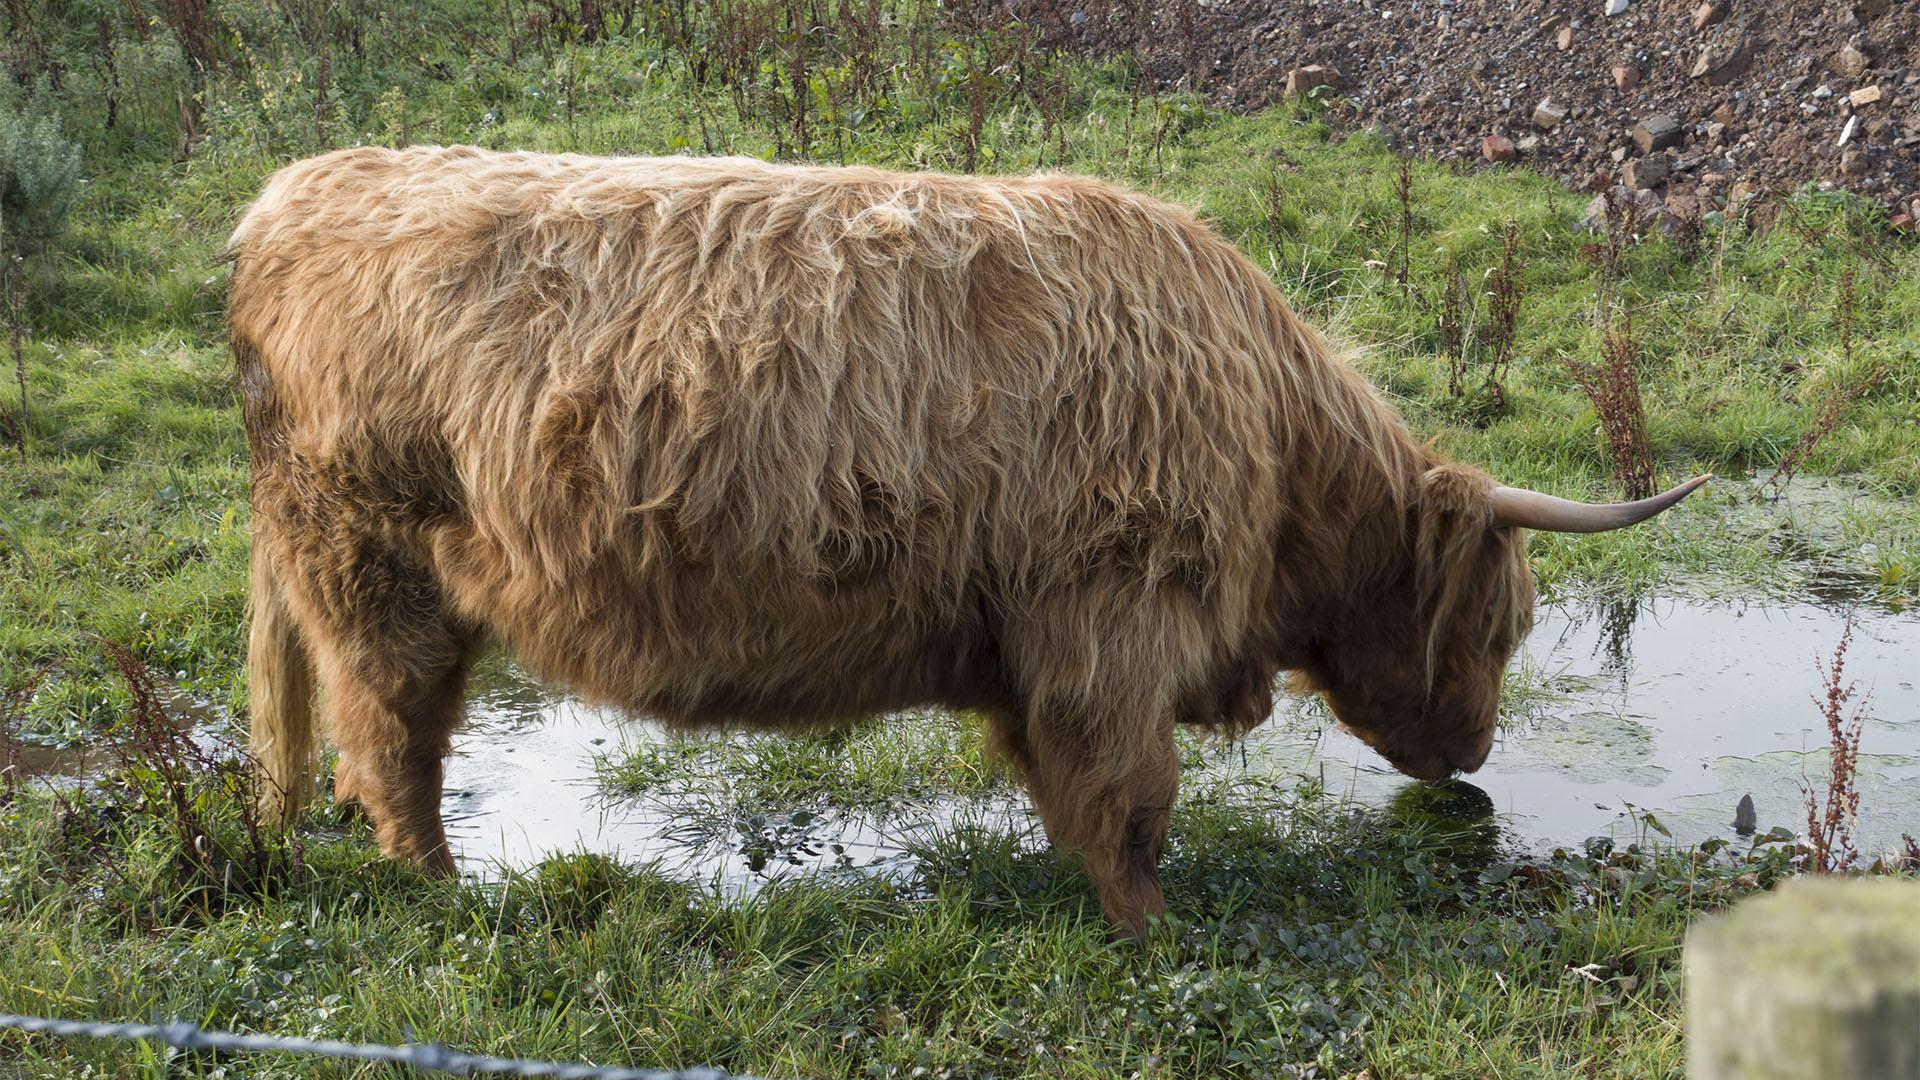 Dreghorn-Swanston(15)cow